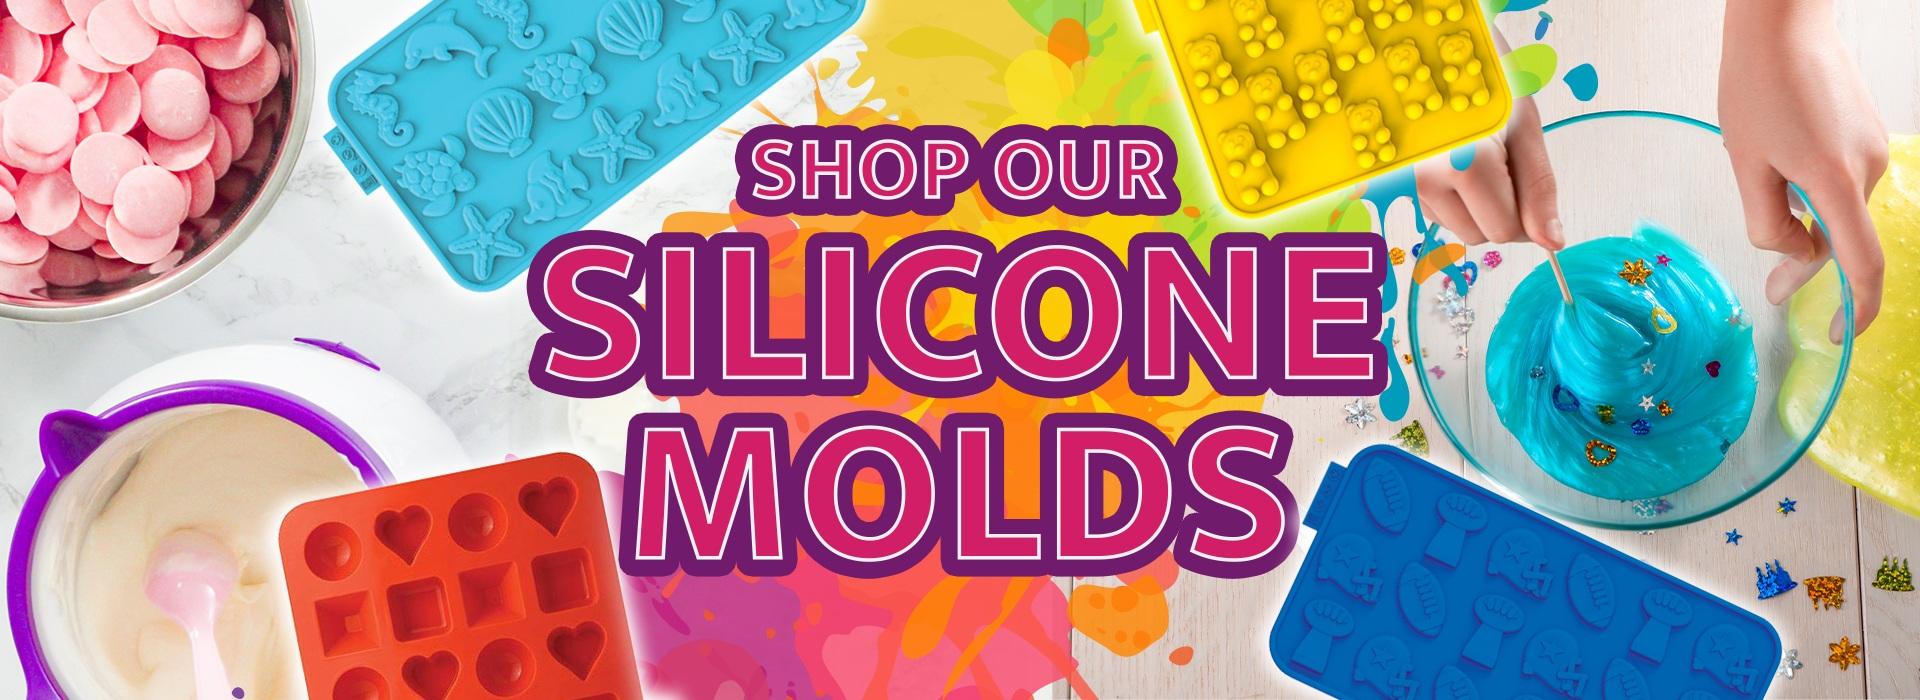 SZ-253215-SiliconeMolds-Website-Banners-1920x700-042621 (1)